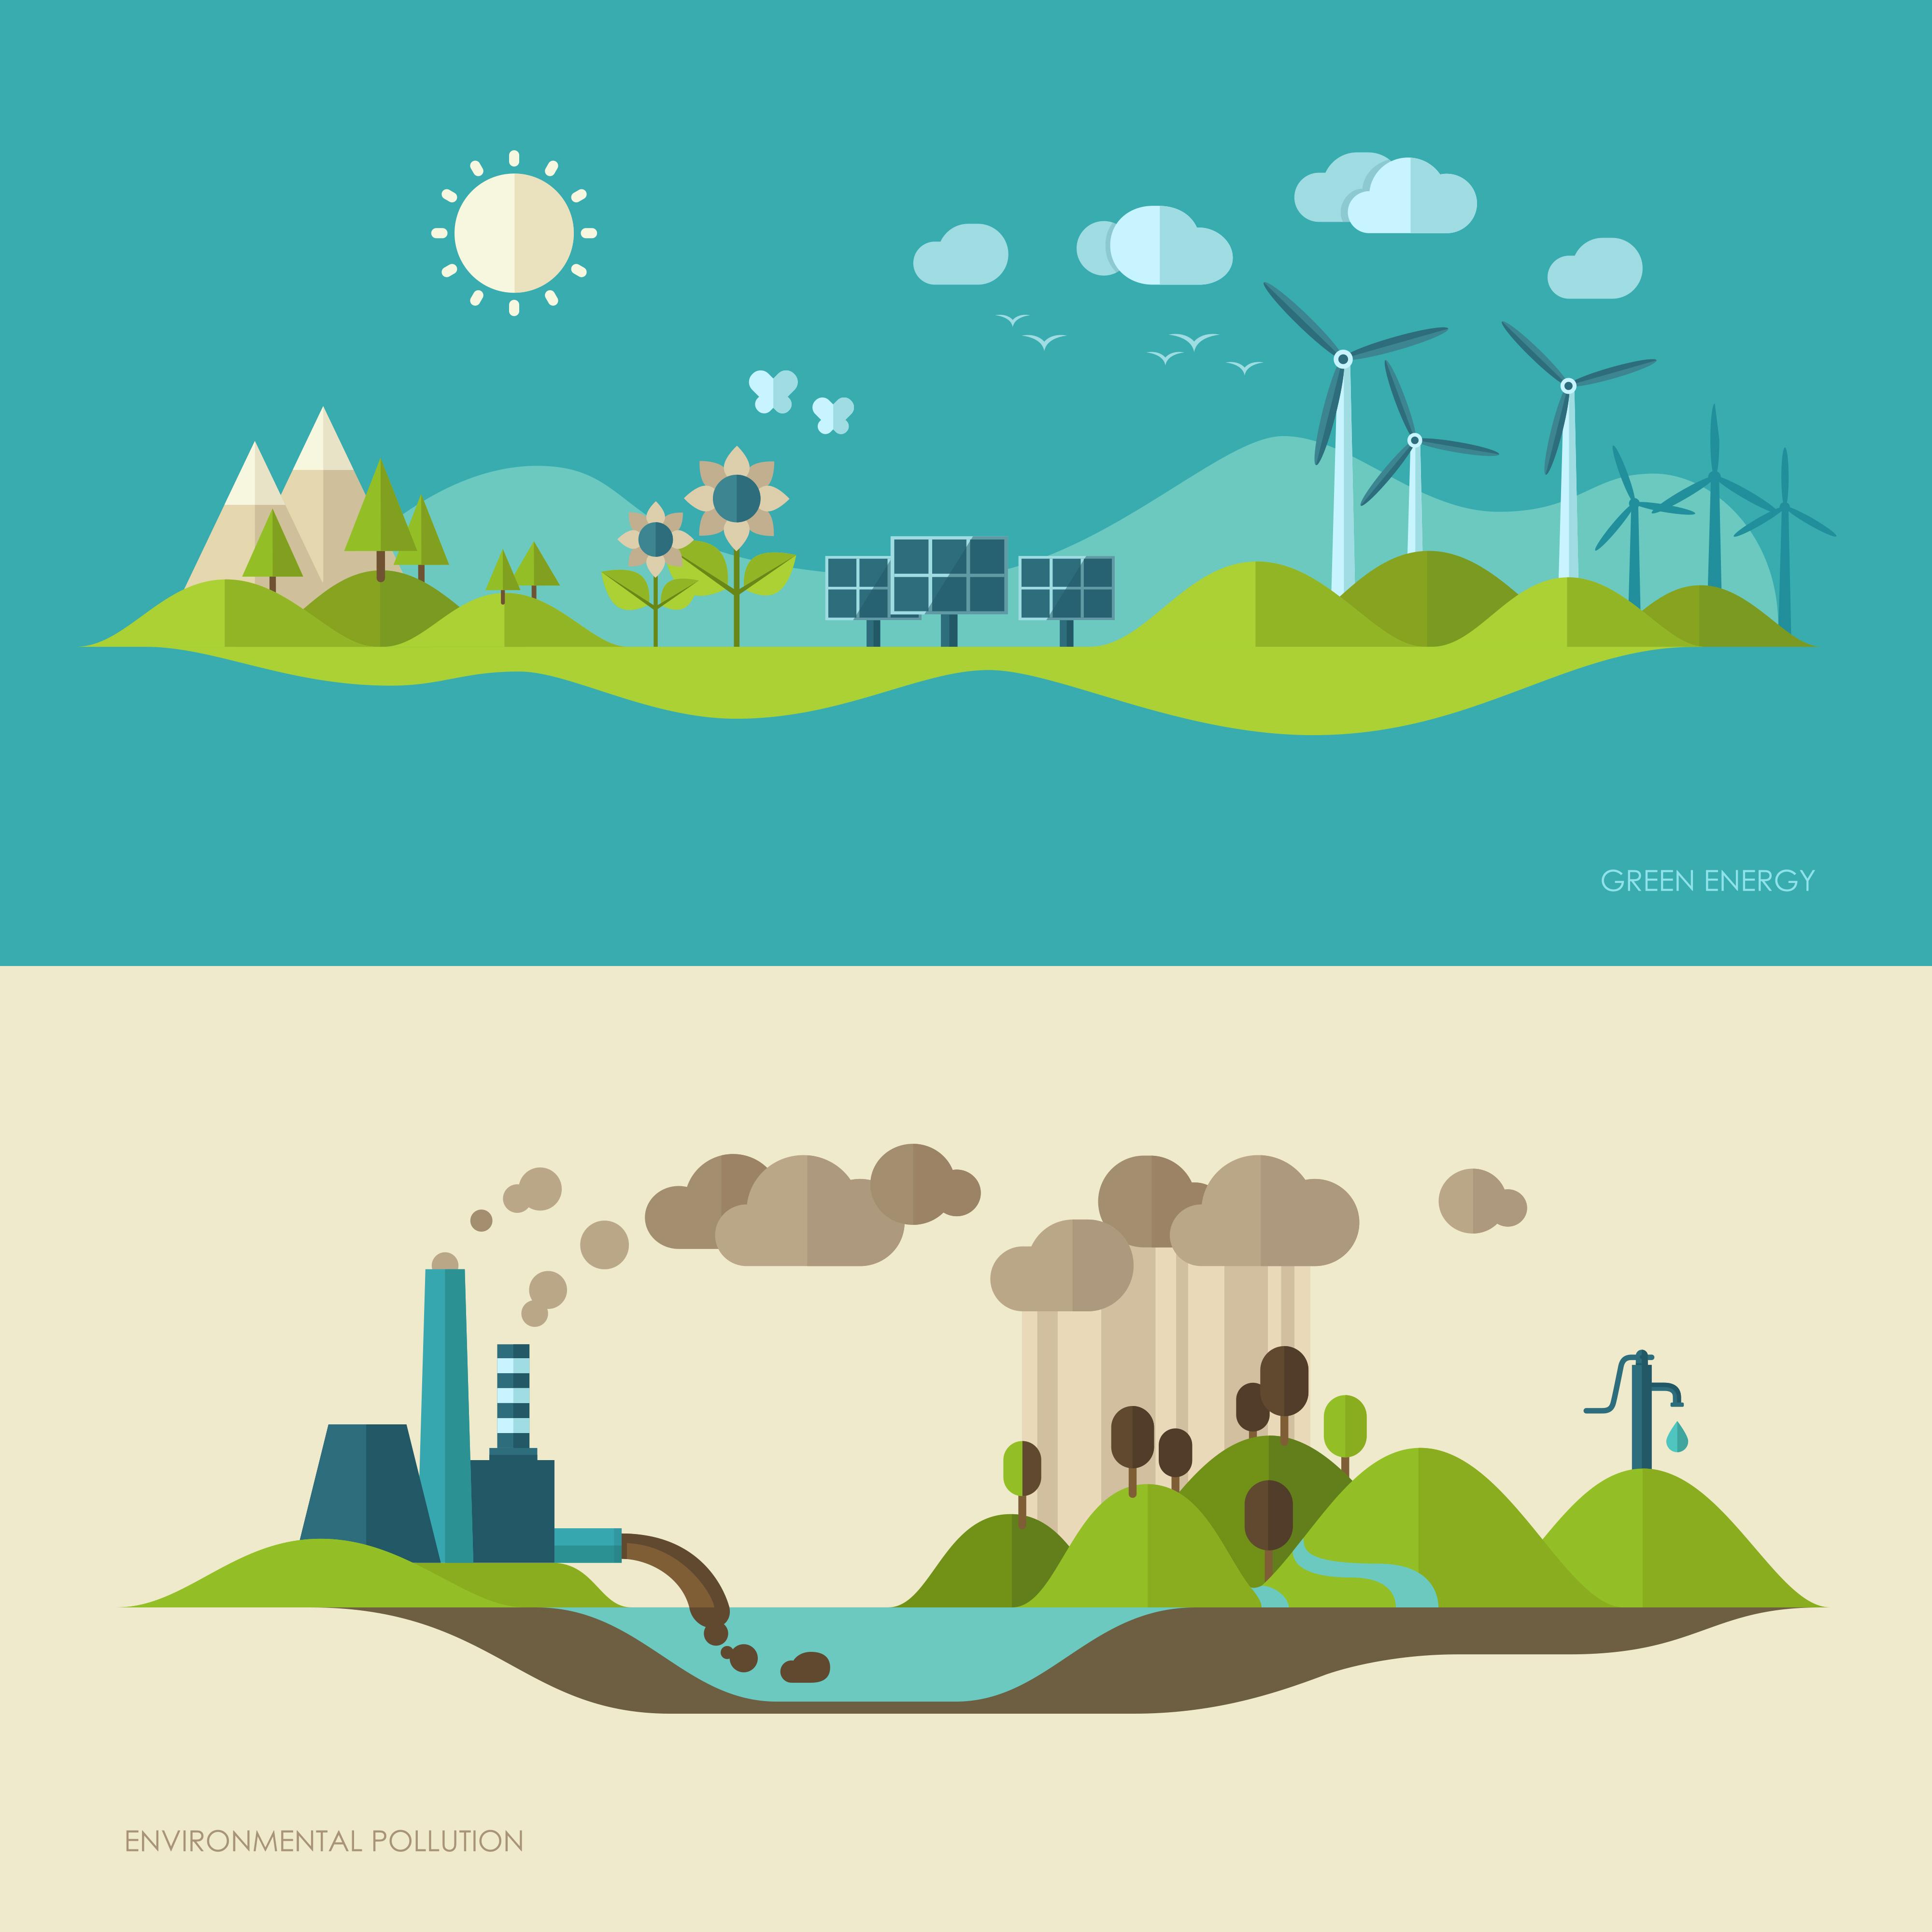 85860173_thumbnail Analysis Ranks Michigan Electric Utilities Based On Renewable Energy